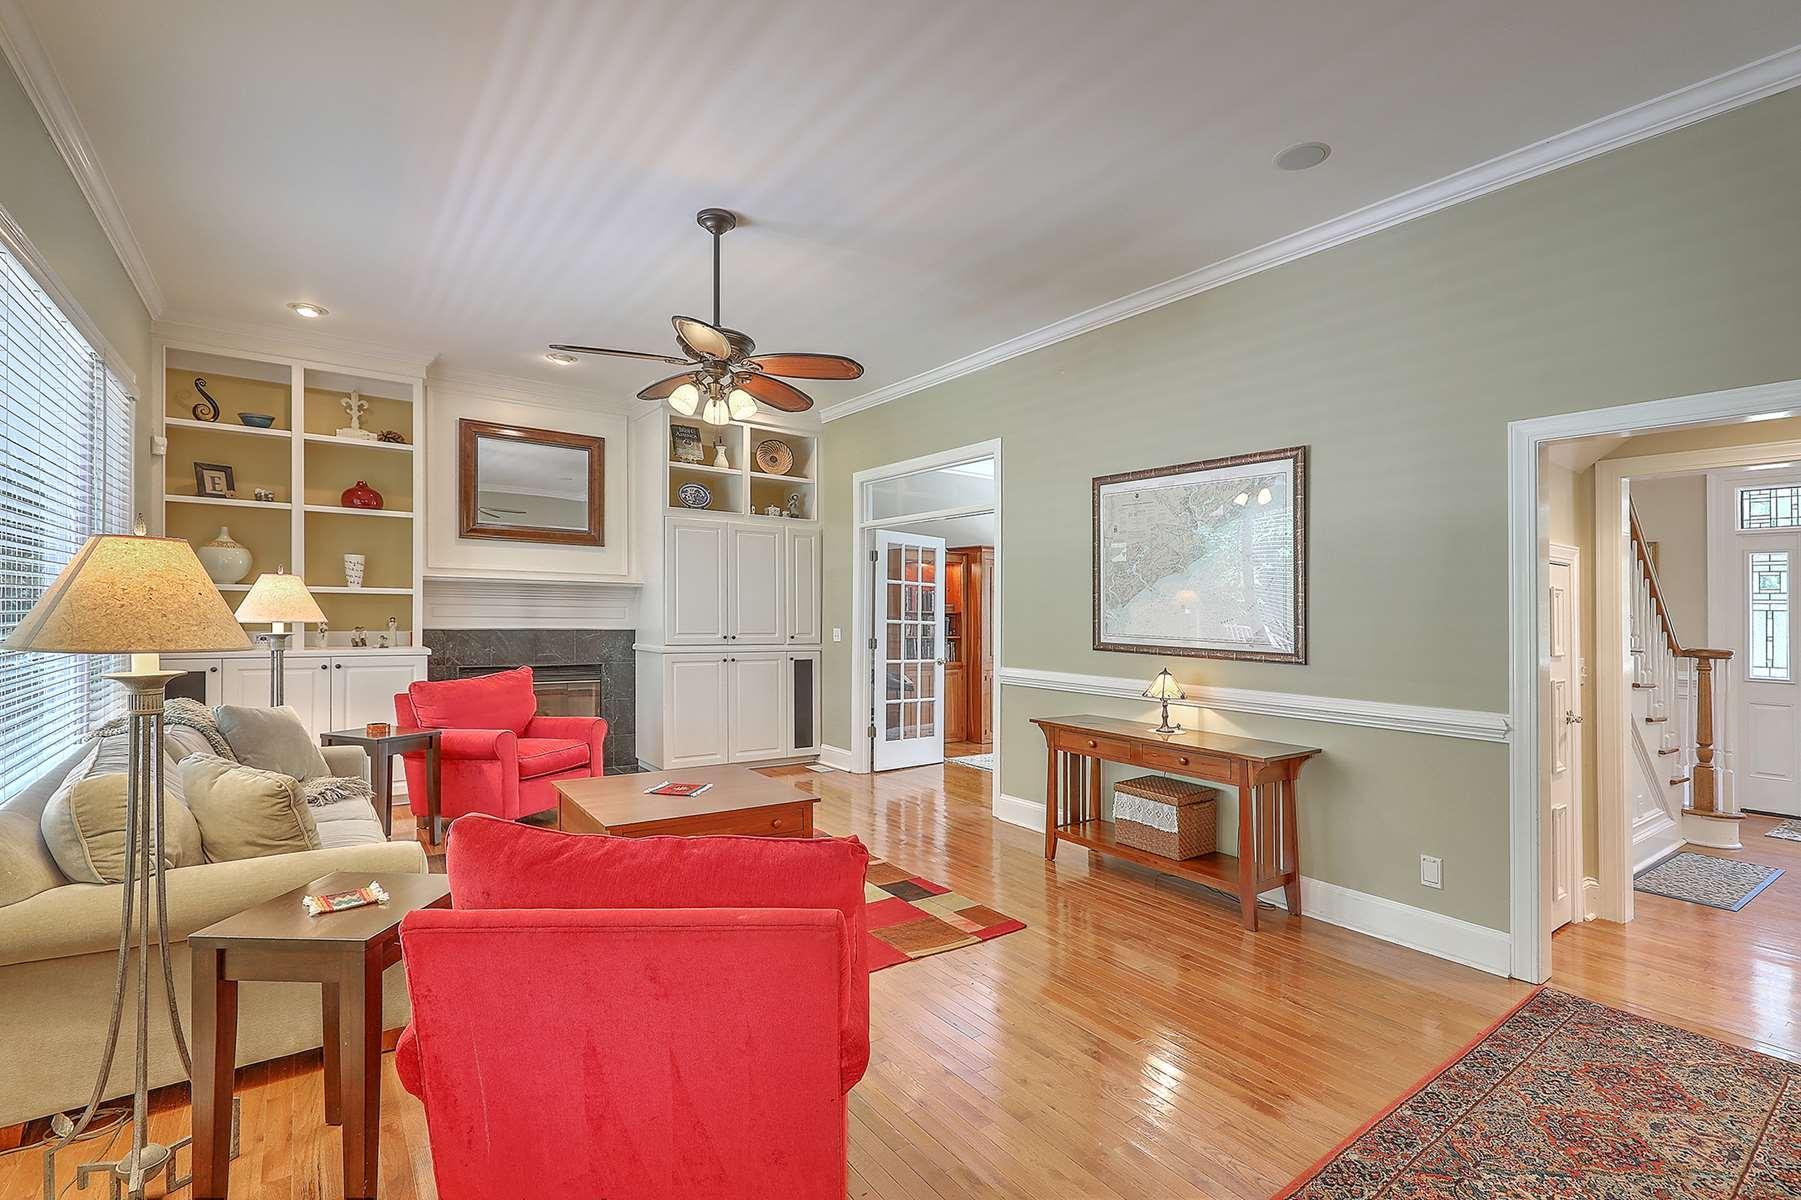 Dunes West Homes For Sale - 2961 Pignatelli, Mount Pleasant, SC - 4